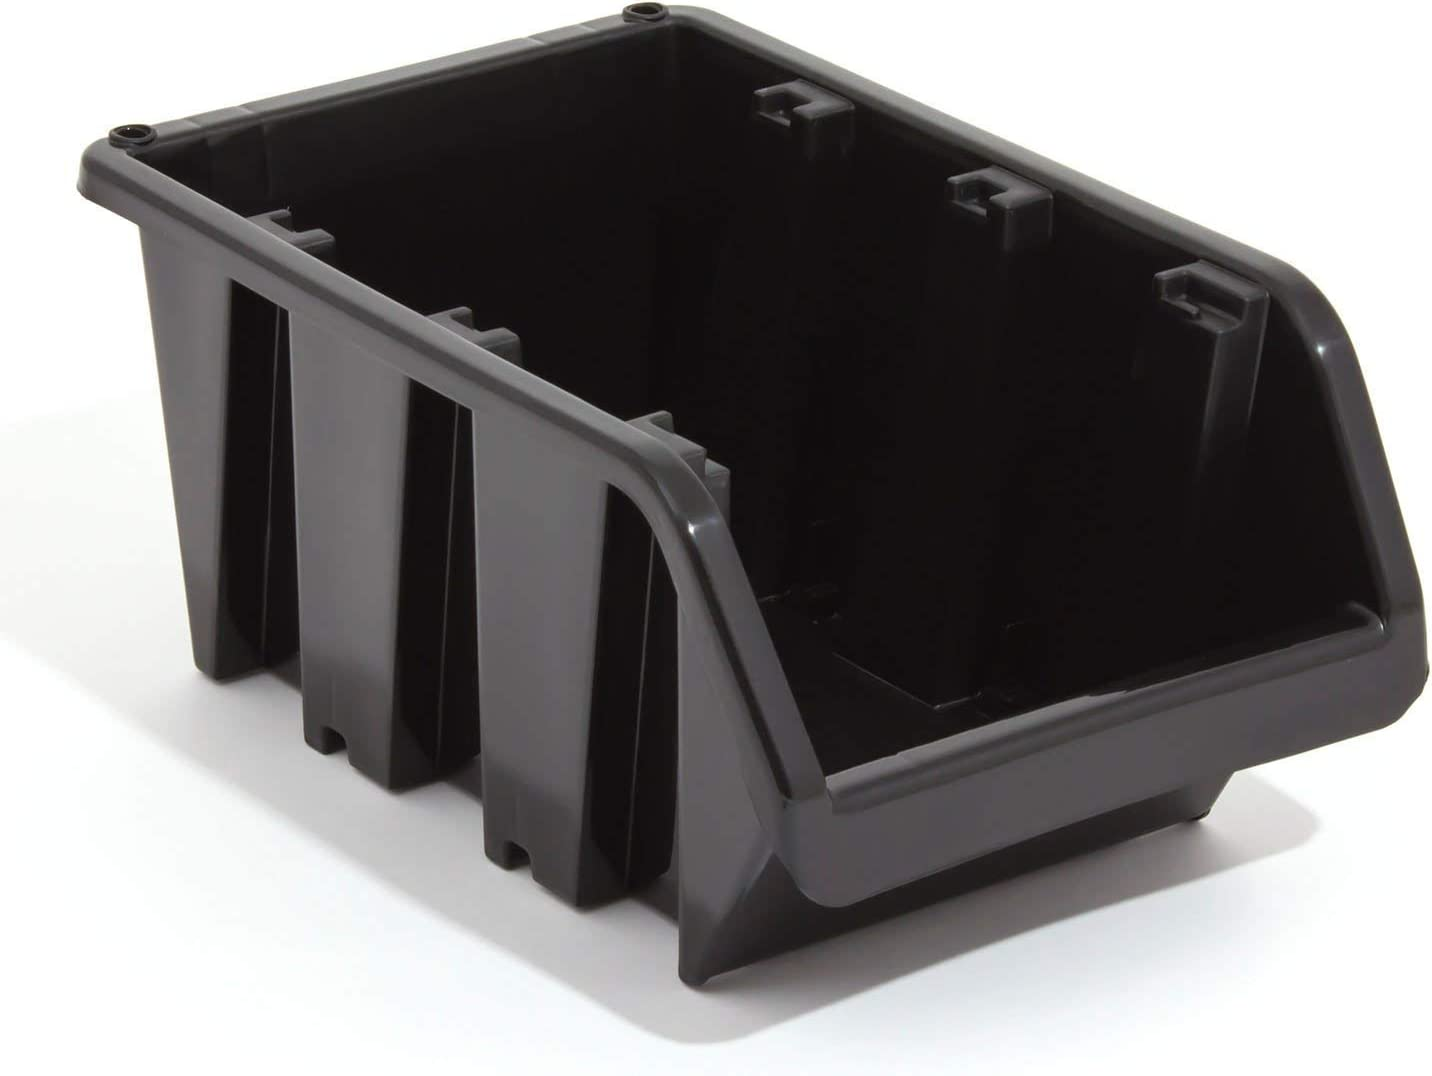 EN-Gehege stapelbar Aufbewahrung Bin Schwarz Gr/ö/ße 1115 x 80 x 60 mm Prosperplast